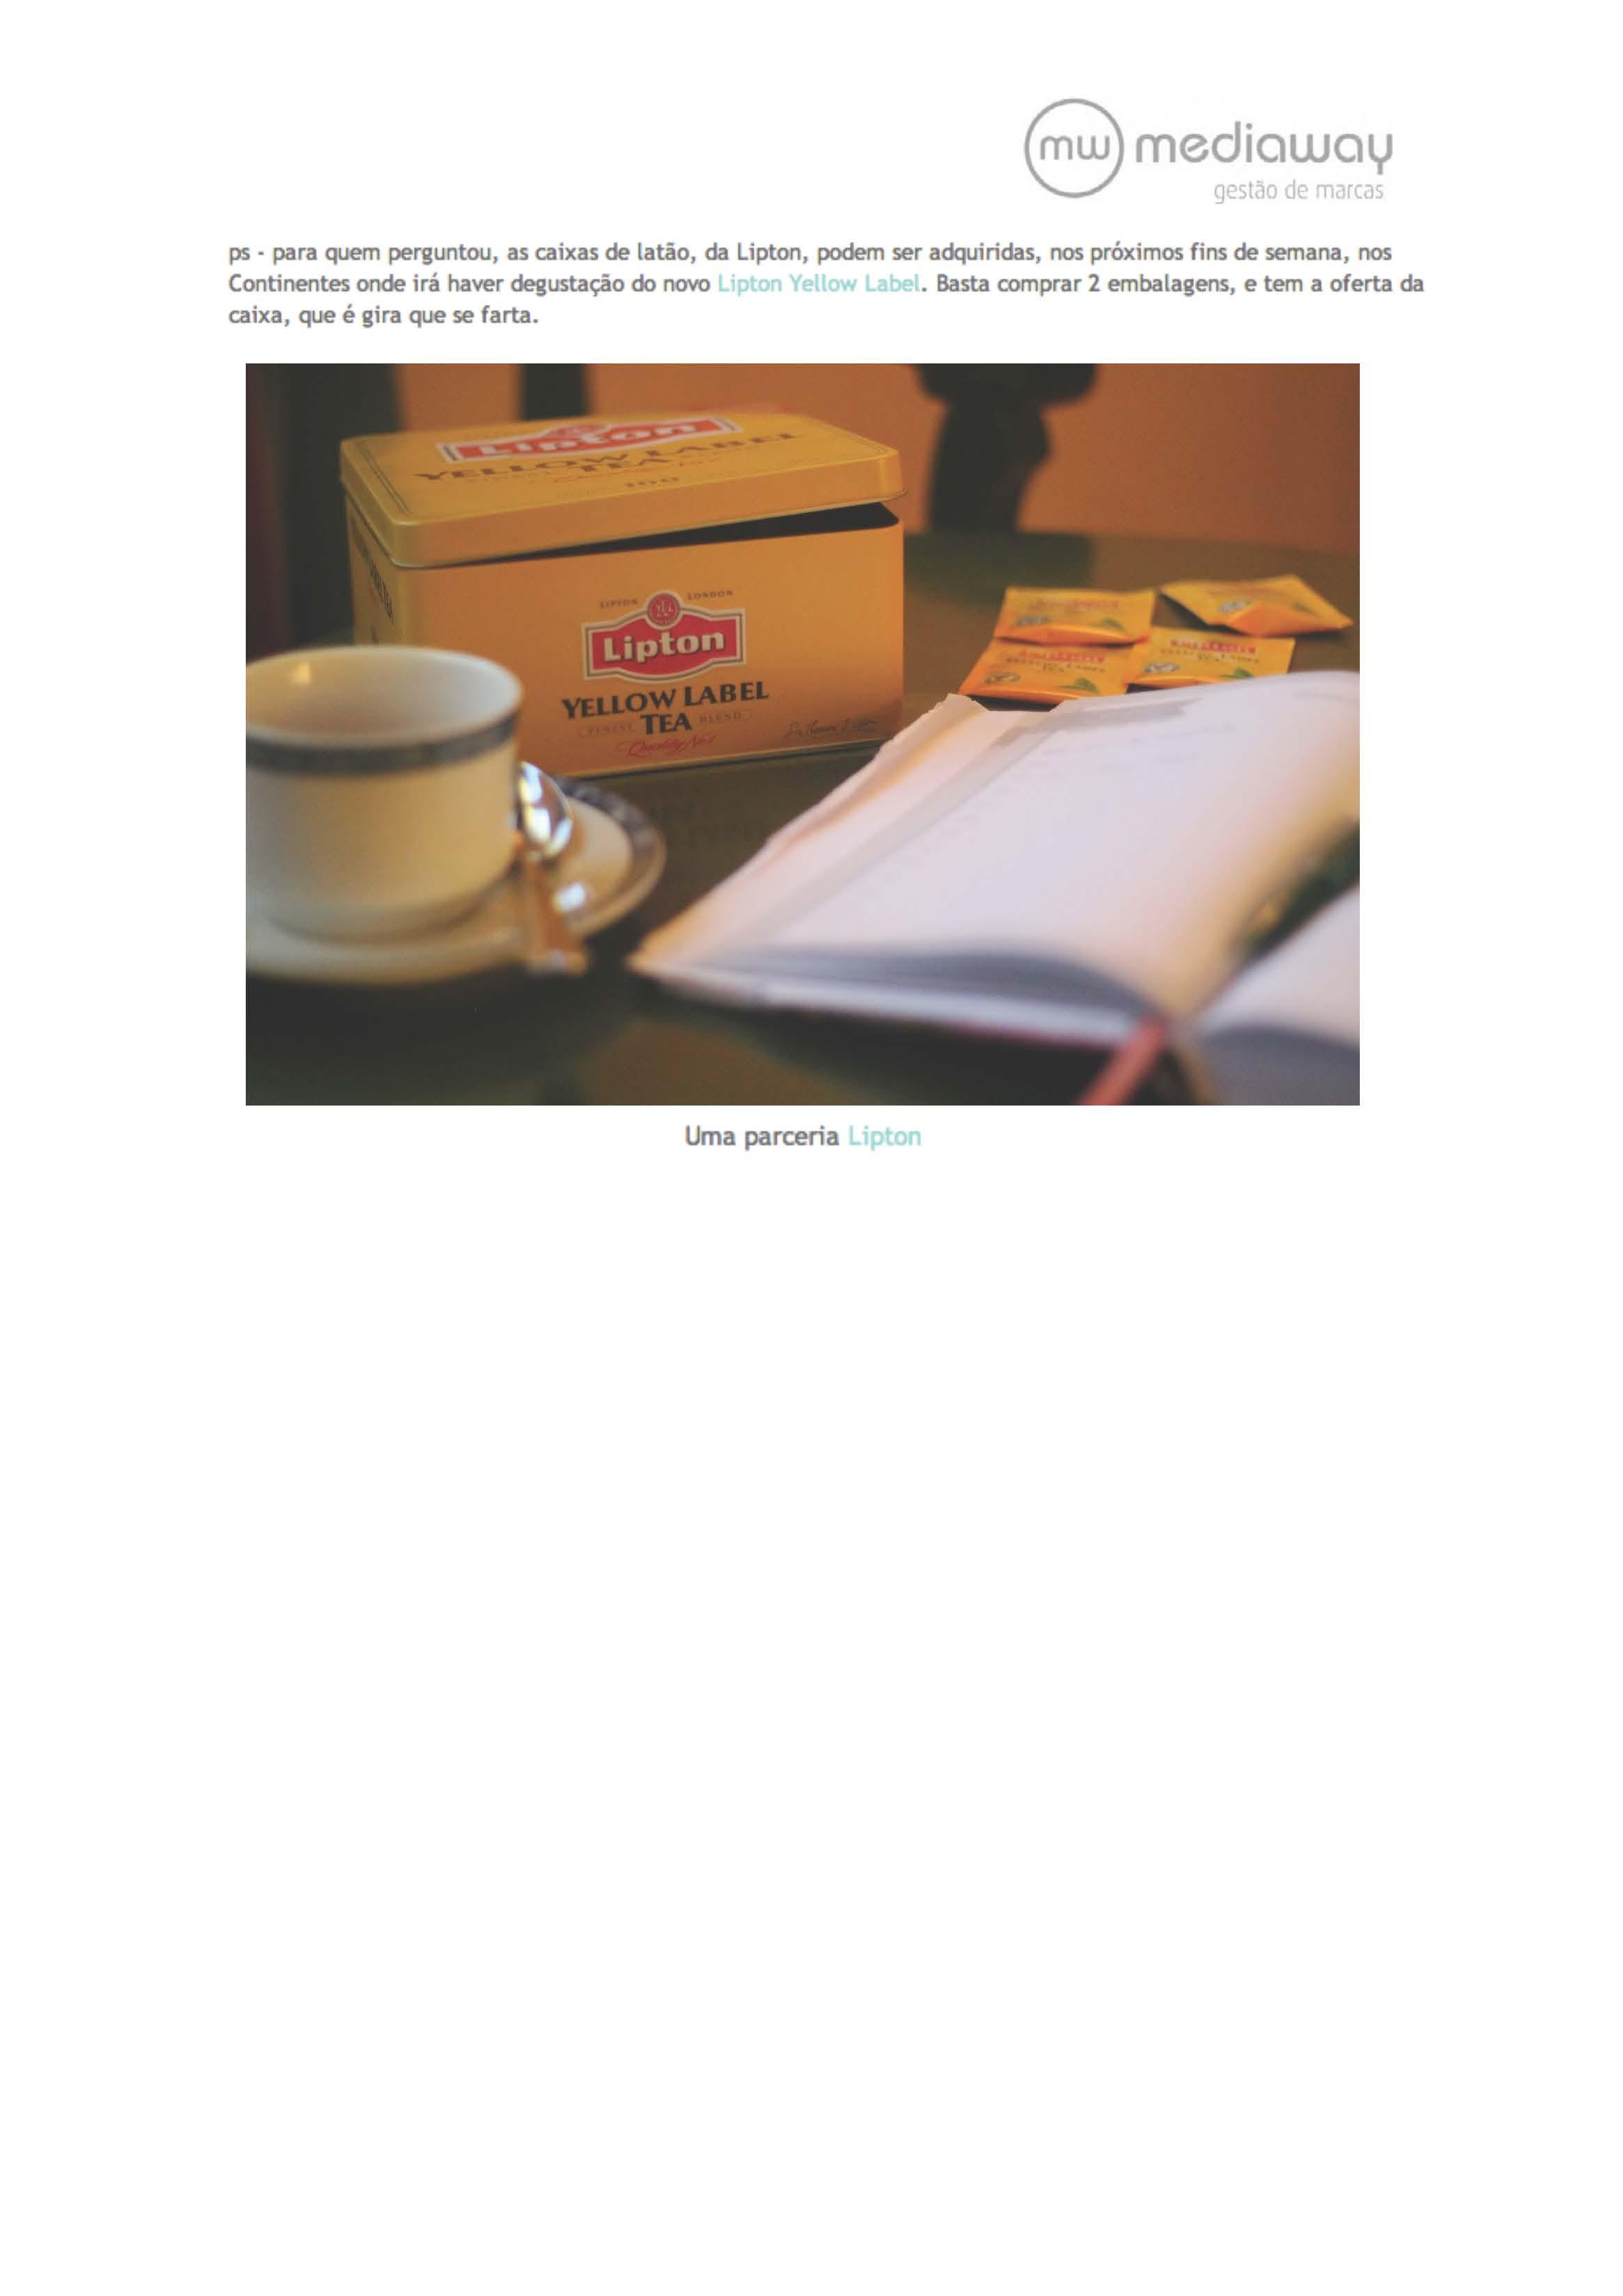 MW_Lipton Social Influencers_Caco Mãe (Post 2)_Page_6.jpg